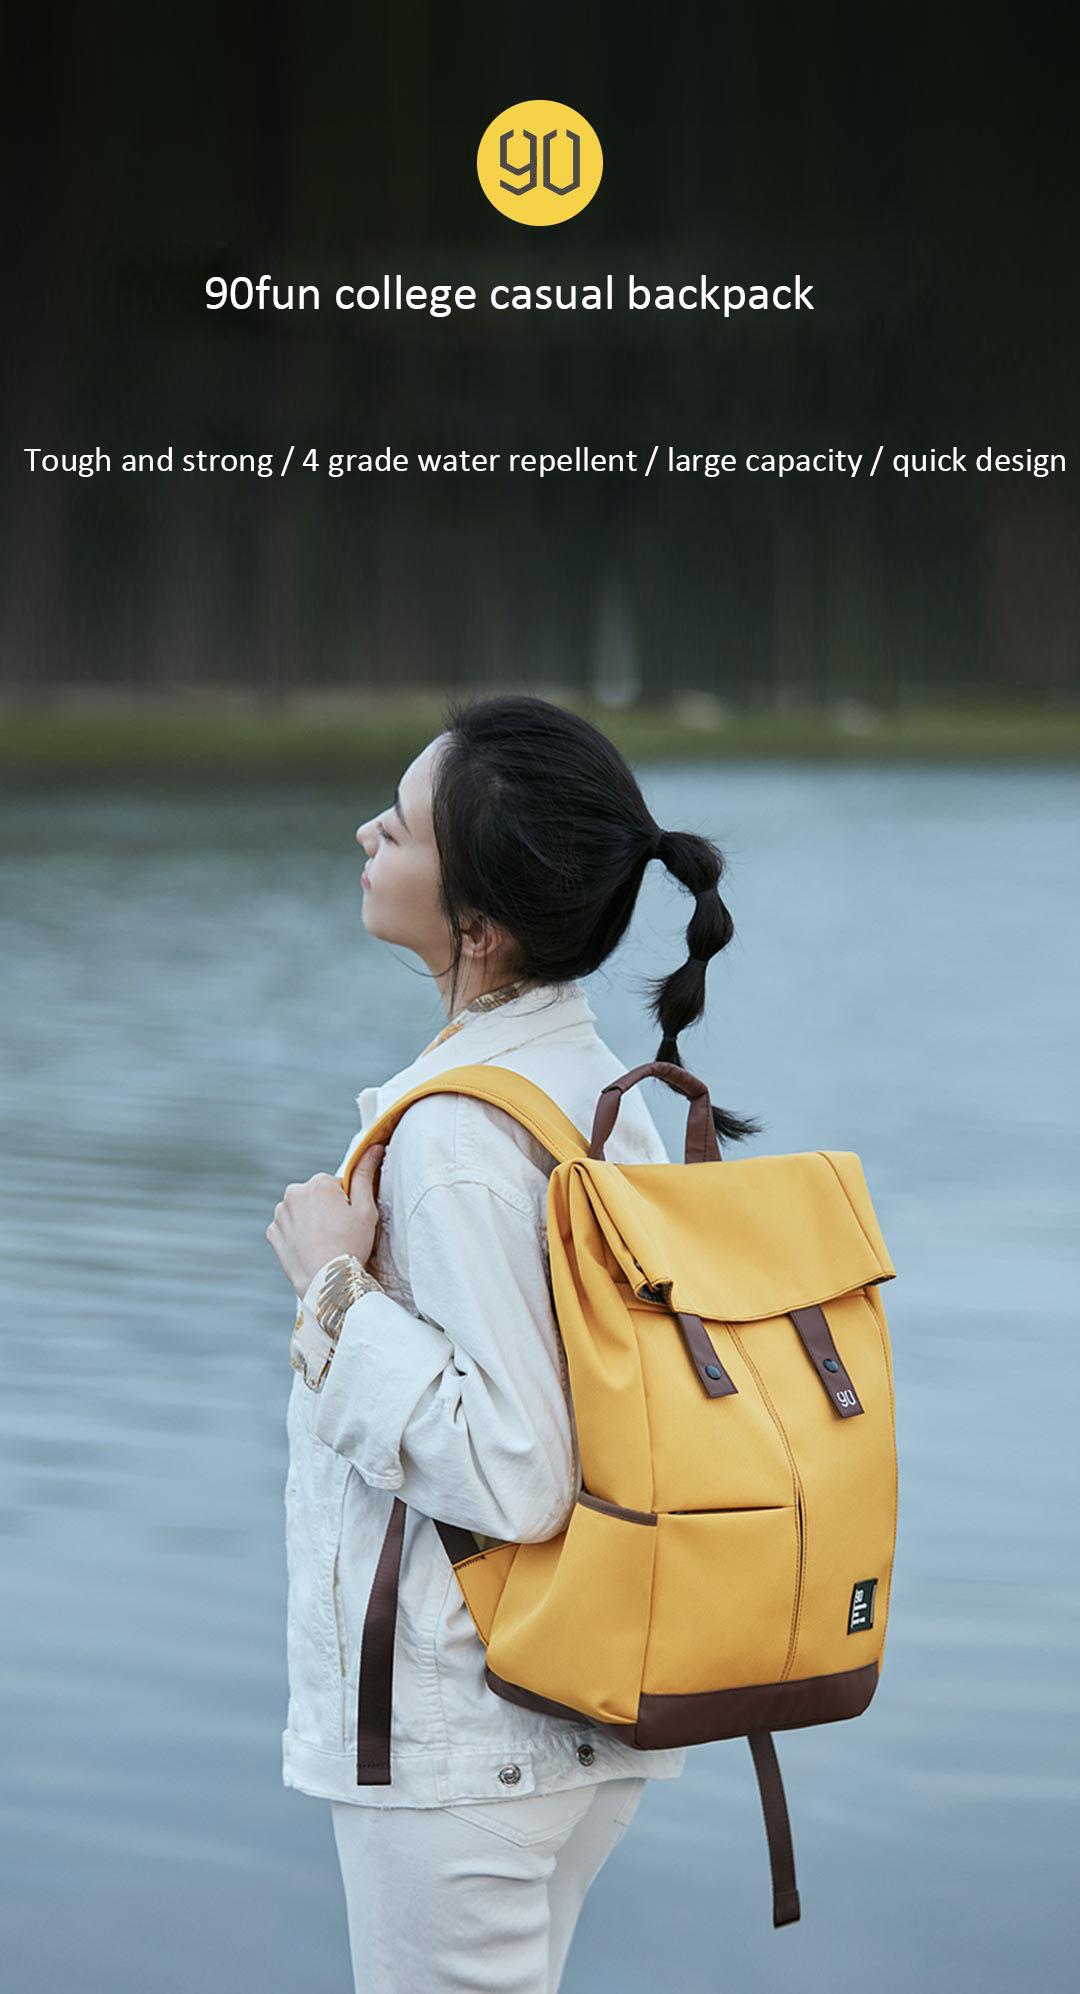 Xiaomi 90fen 90fun Backpack Ipx4 Water Repellent 13L Large Capacity Knapsack